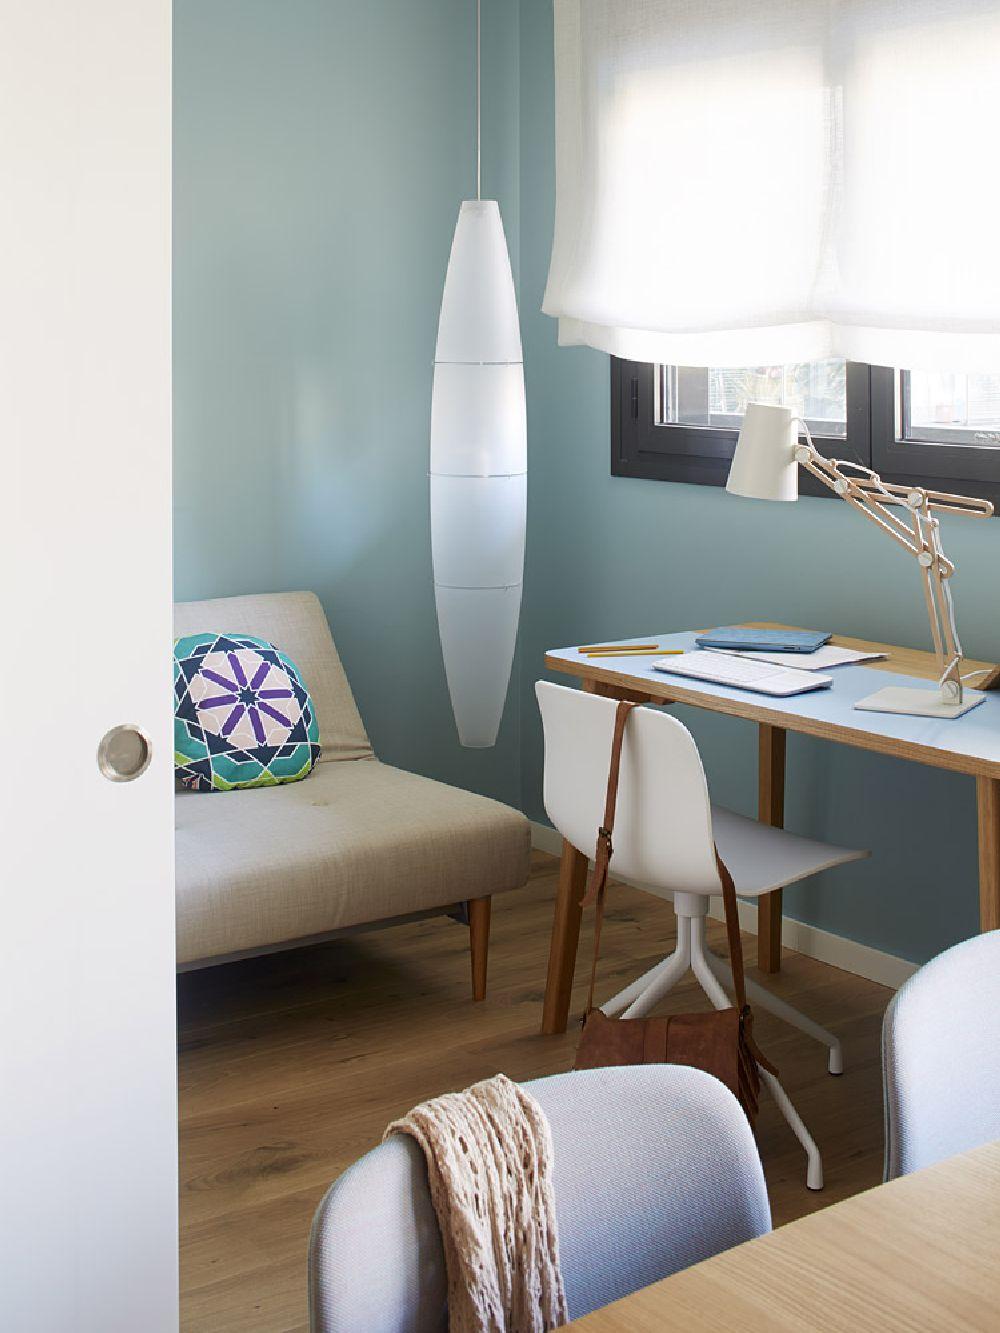 adelaparvu.com despre apartament cu aer mediteranean, design interior Meritxell Ribe (6)